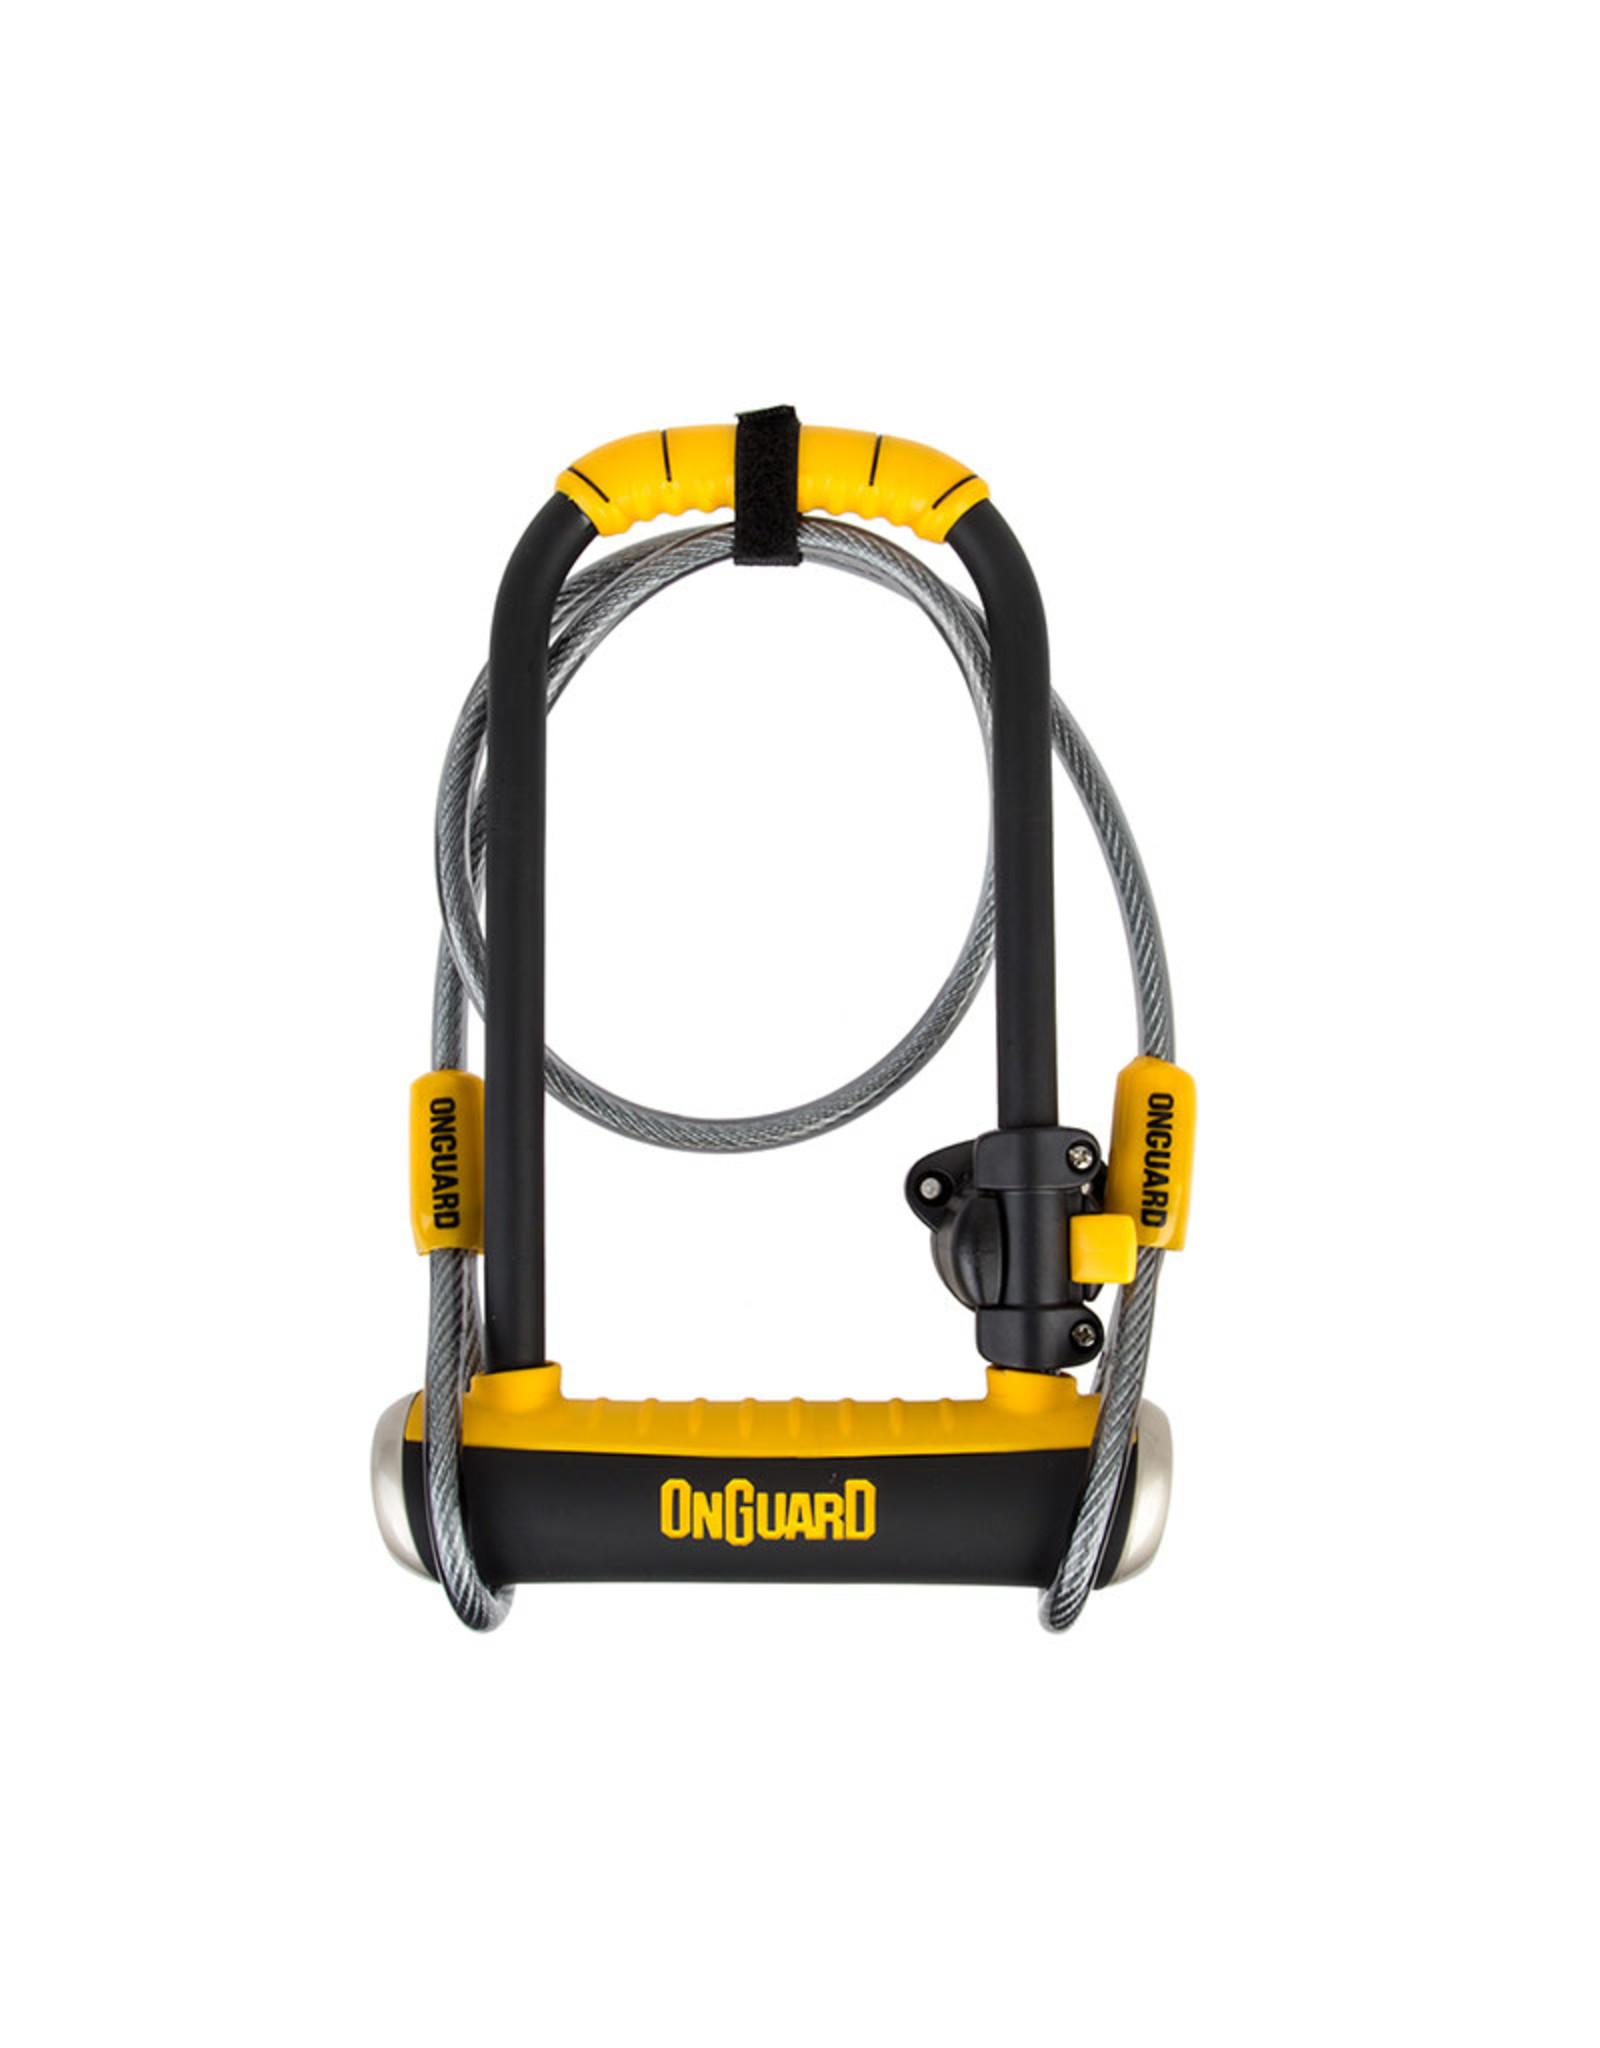 ONGUARD OnGuard 8005 Pitbull U-Lock Standard 4.5x9/10mmx4ft Cable